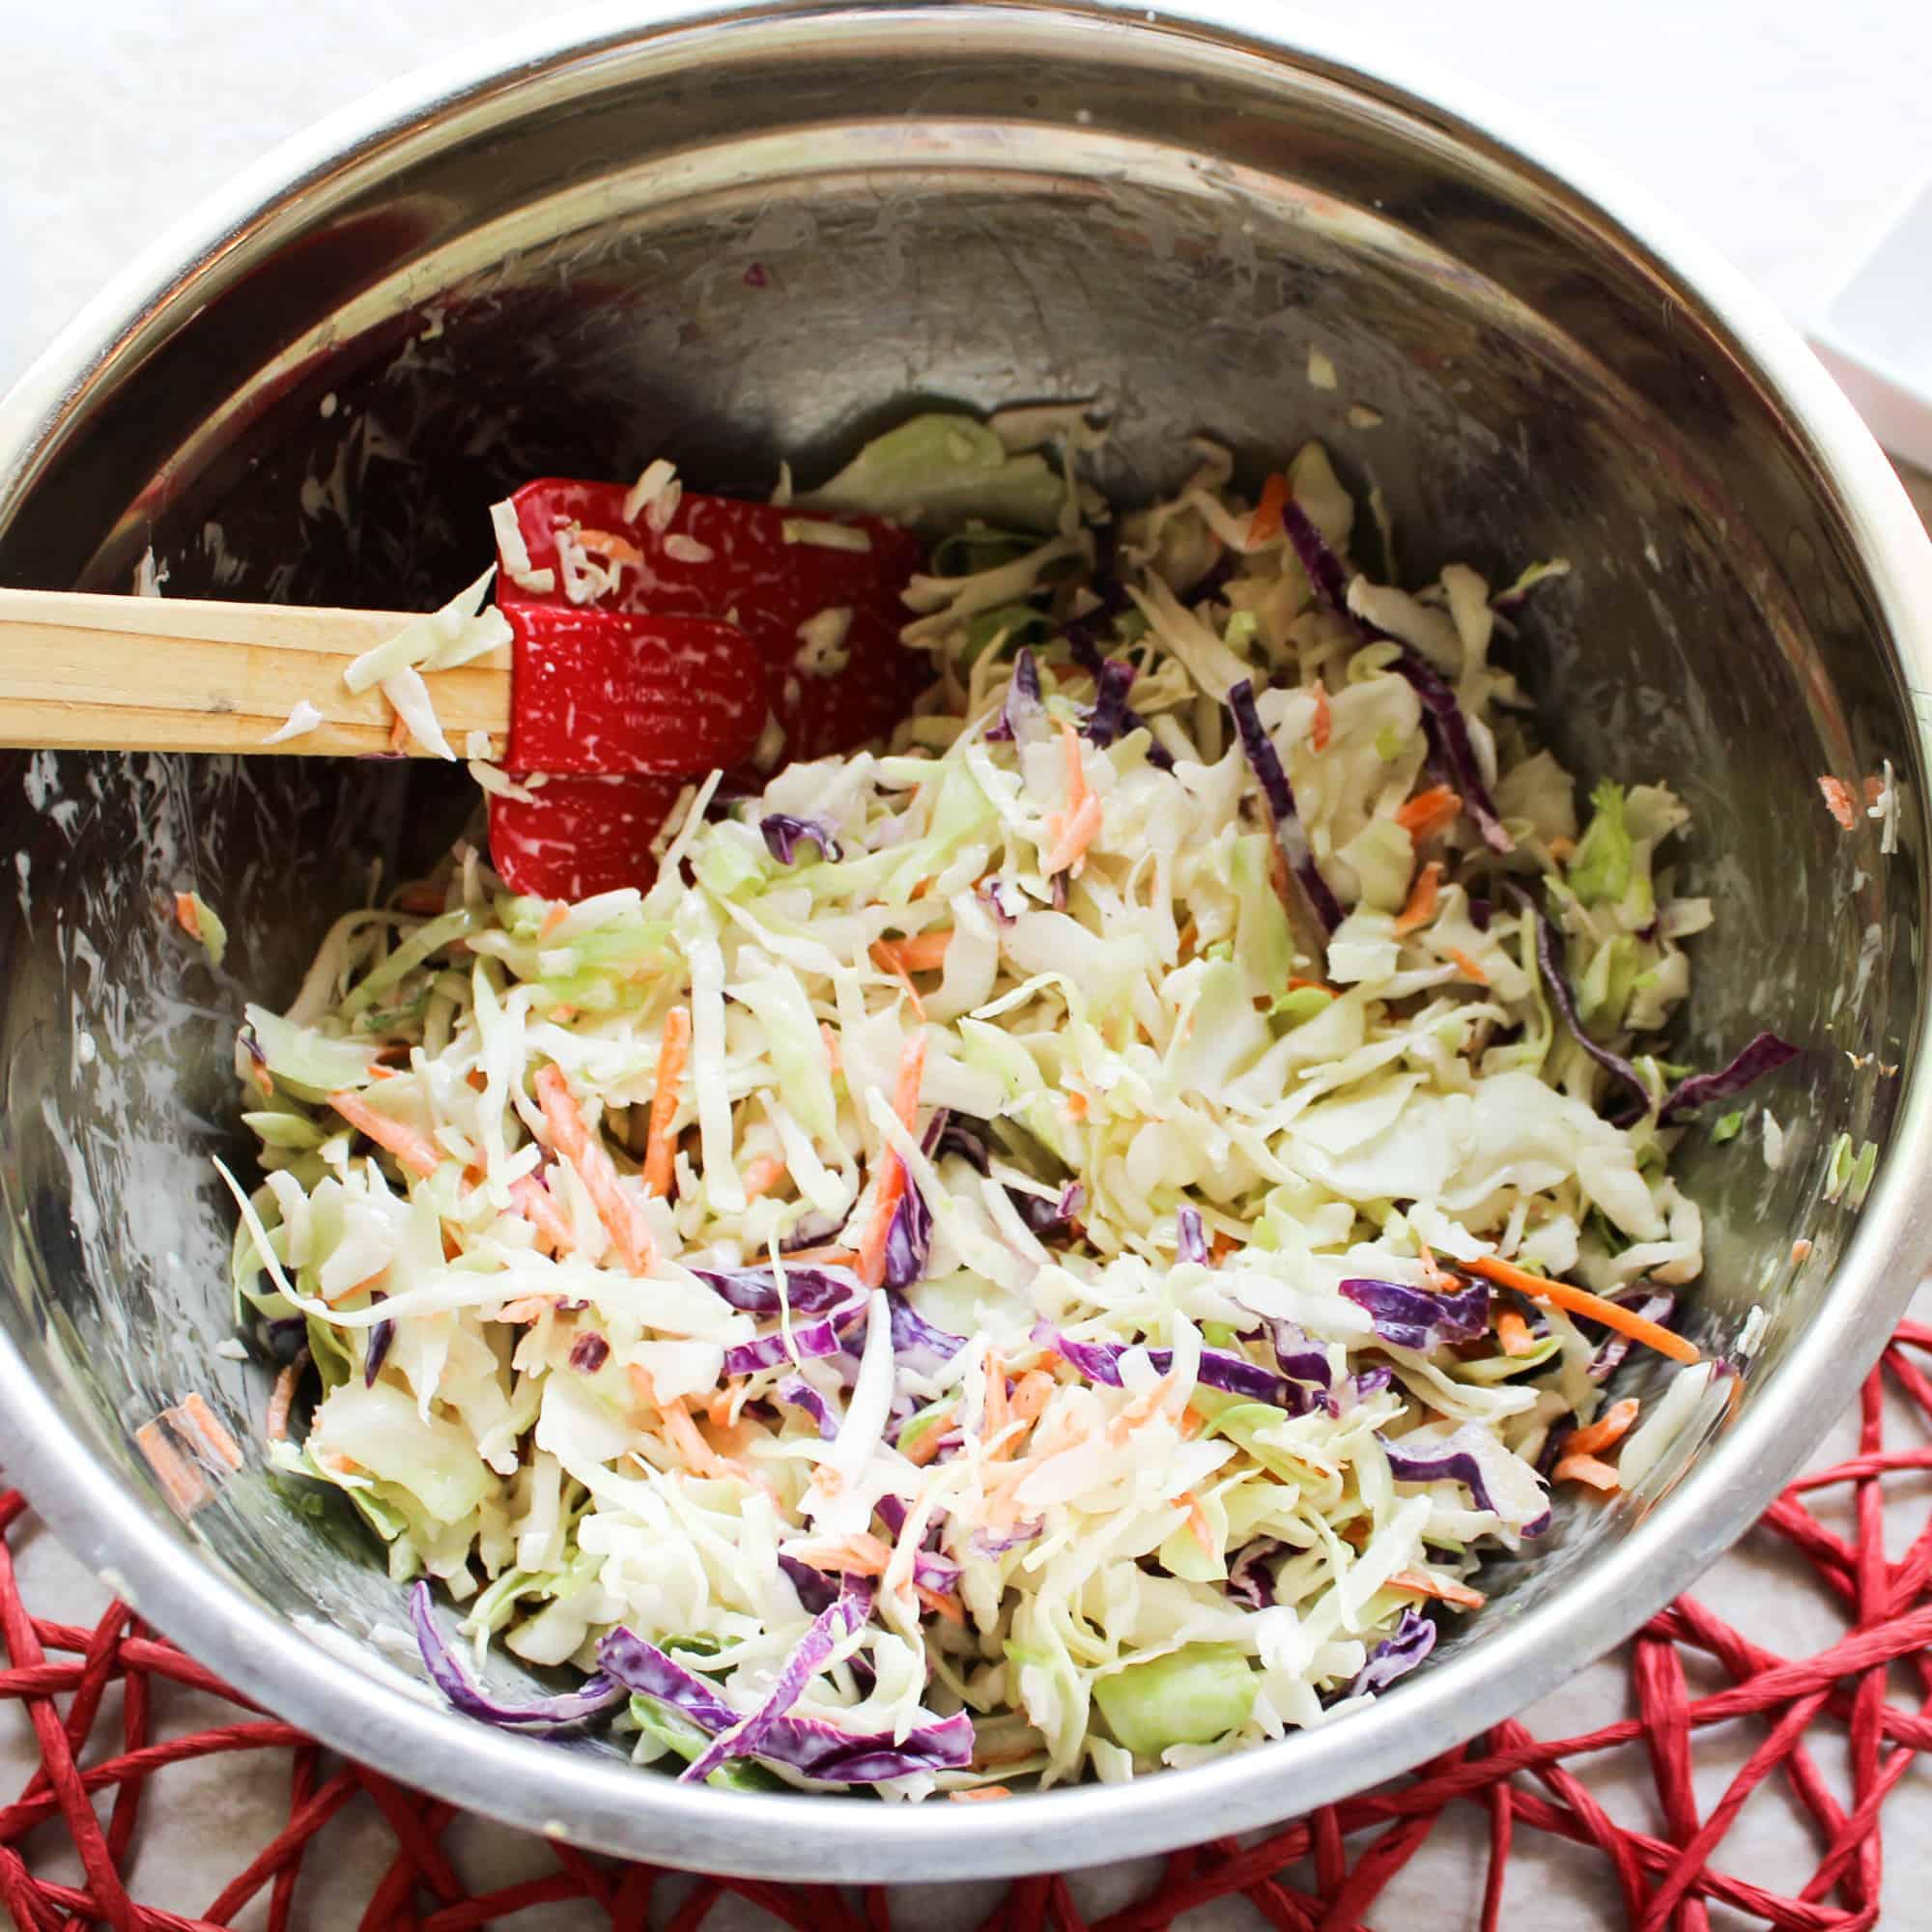 mix coleslaw